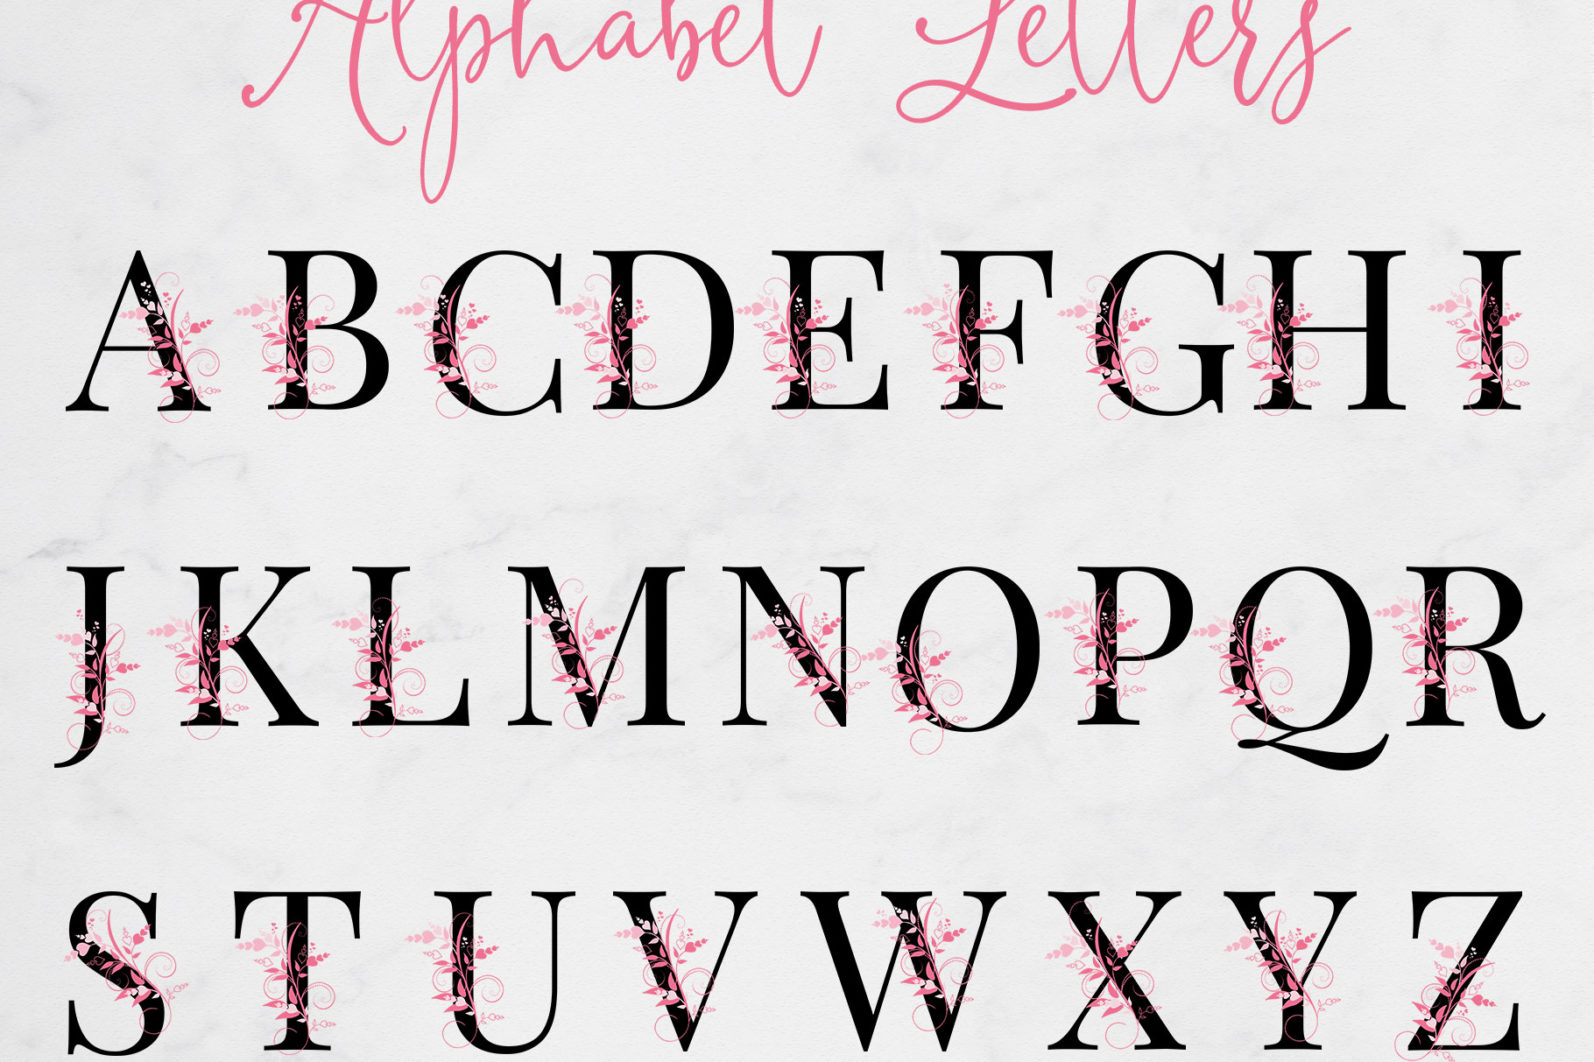 Floral & Heart Alphabet Letters - letters page -